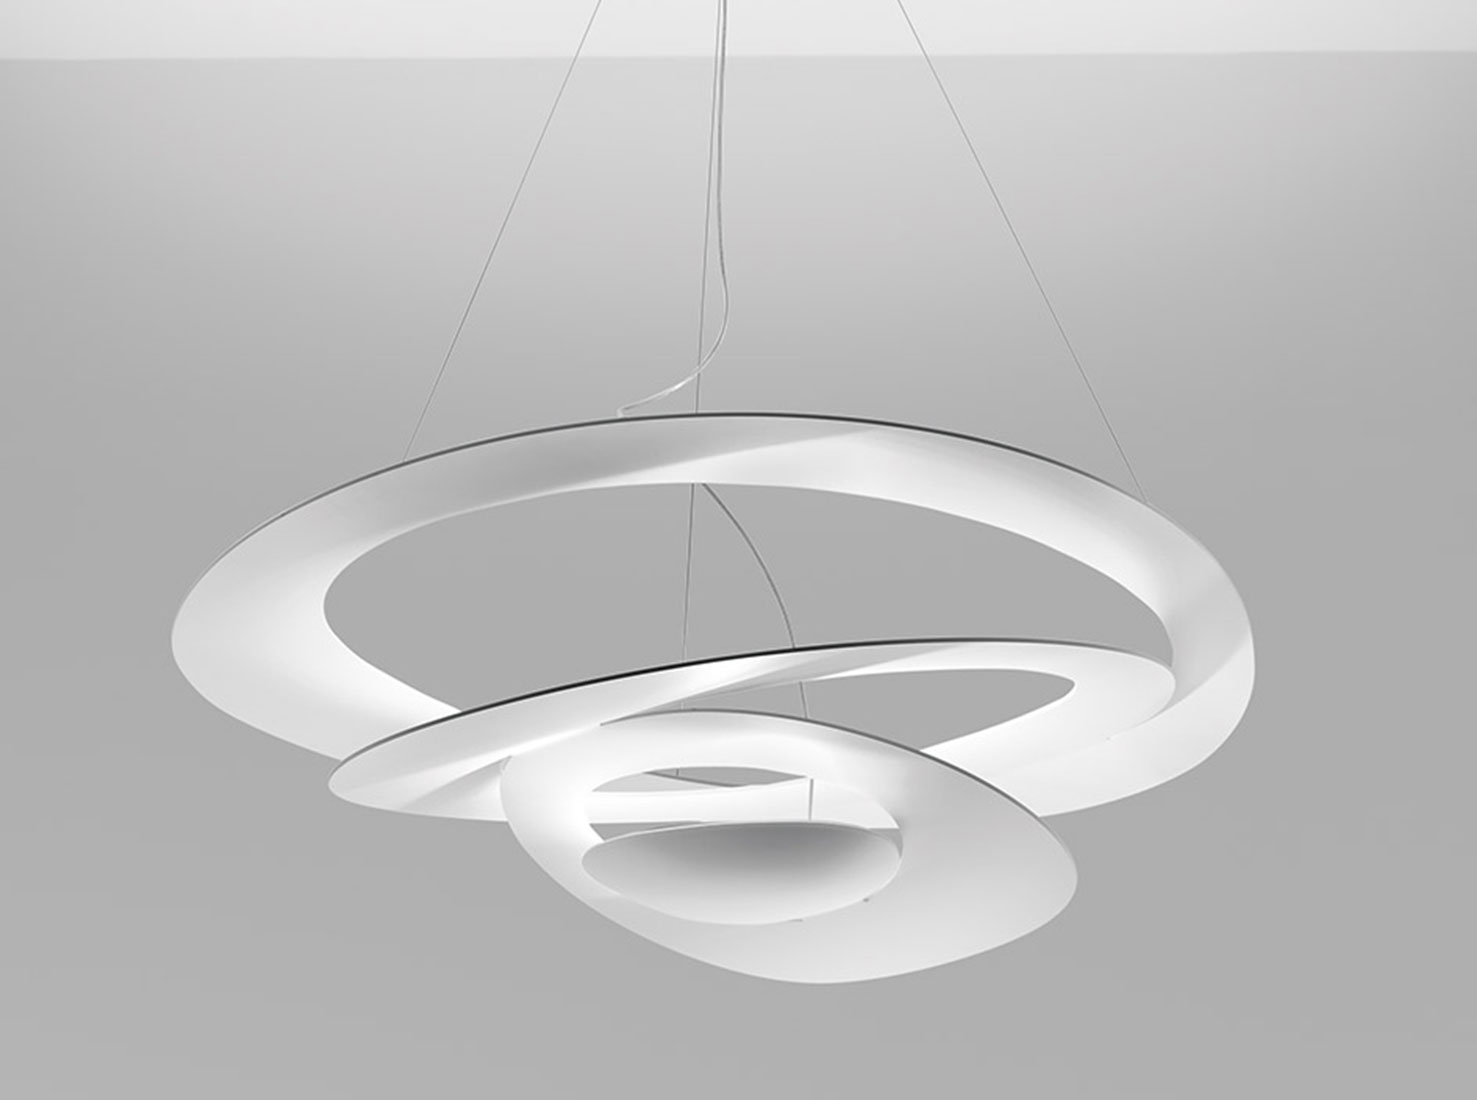 светильник Pirce фото